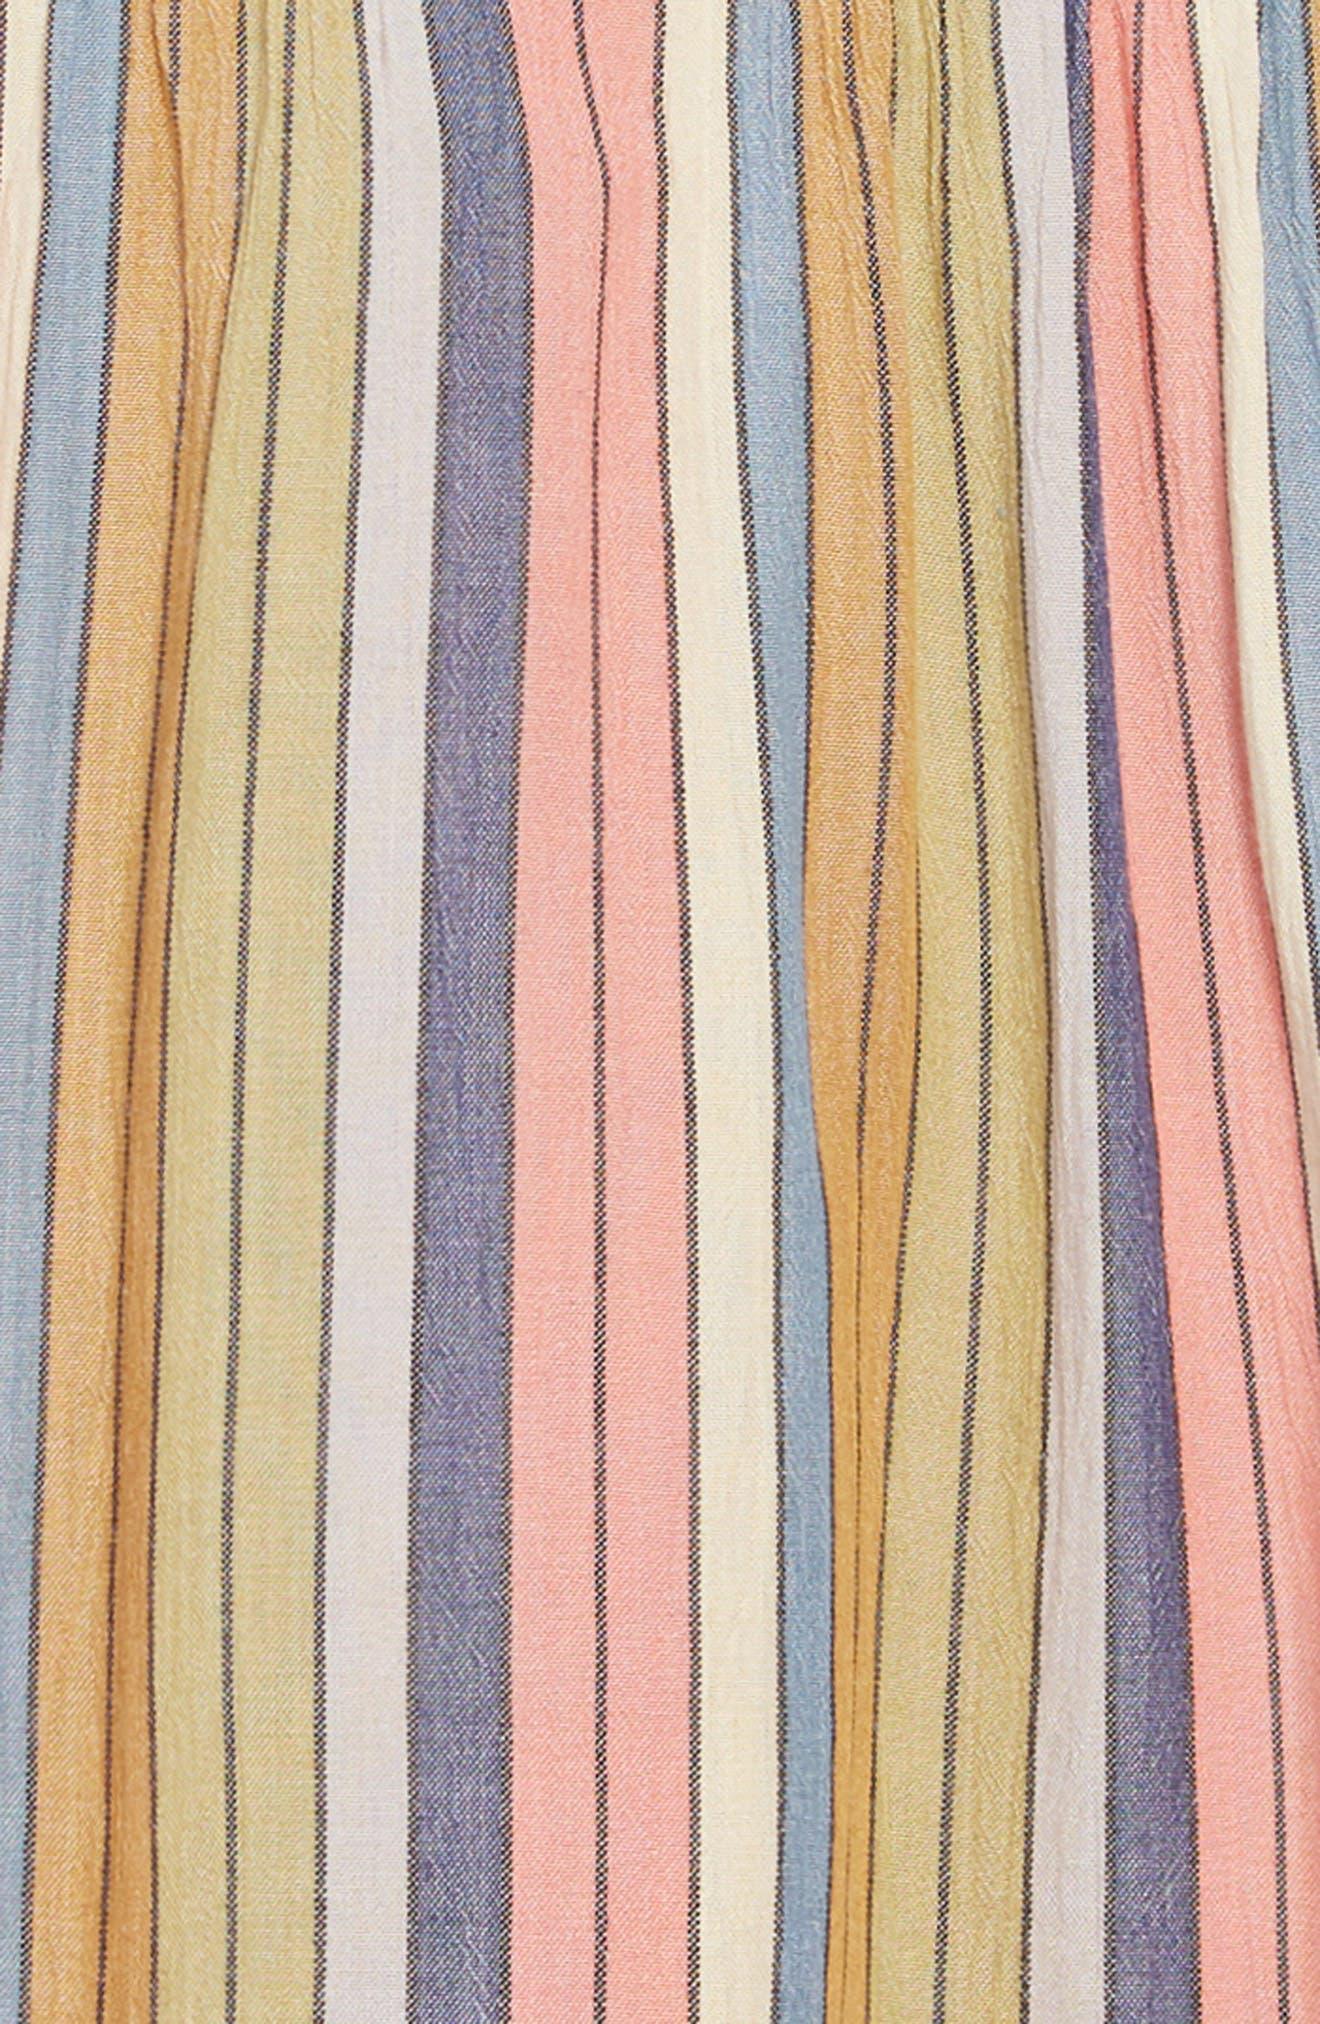 O'NEILL,                             Berlin Stripe Sundress,                             Alternate thumbnail 5, color,                             MULTI COLORED